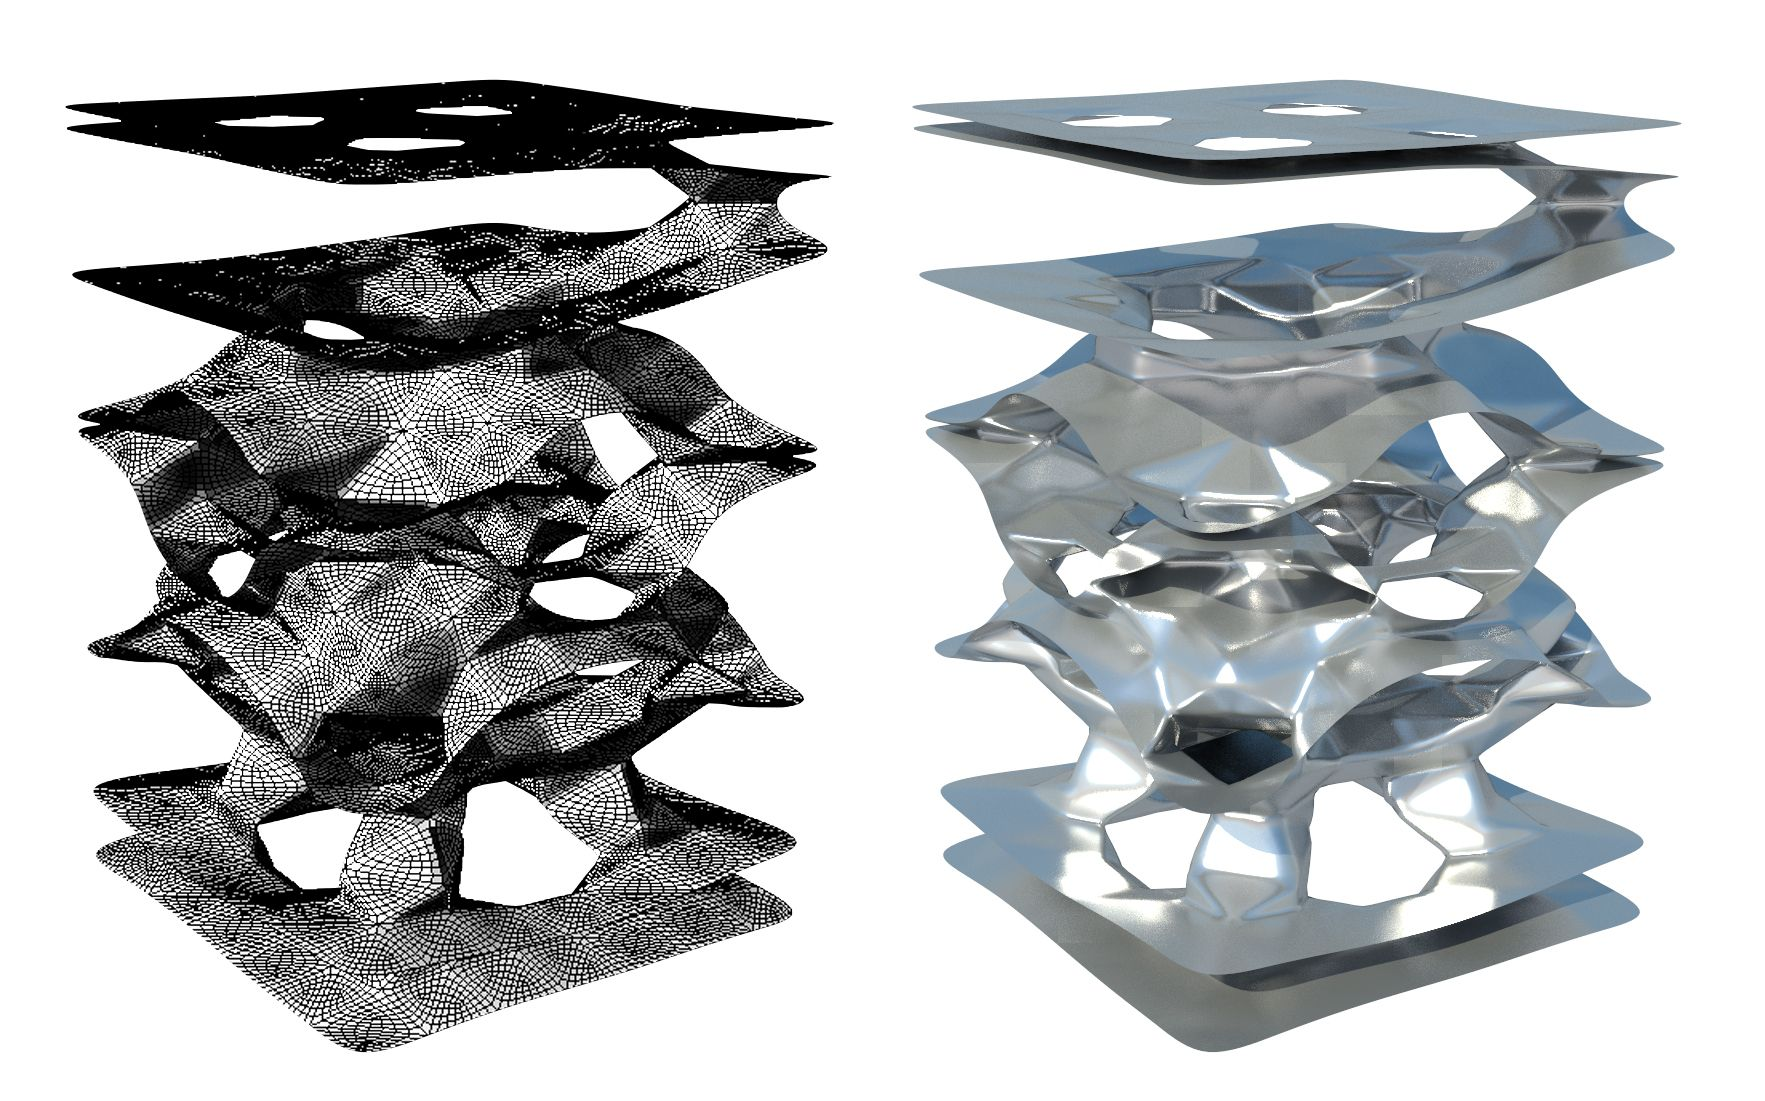 3d Cellular Automata   Inspiration_Grasshopper   Pinterest